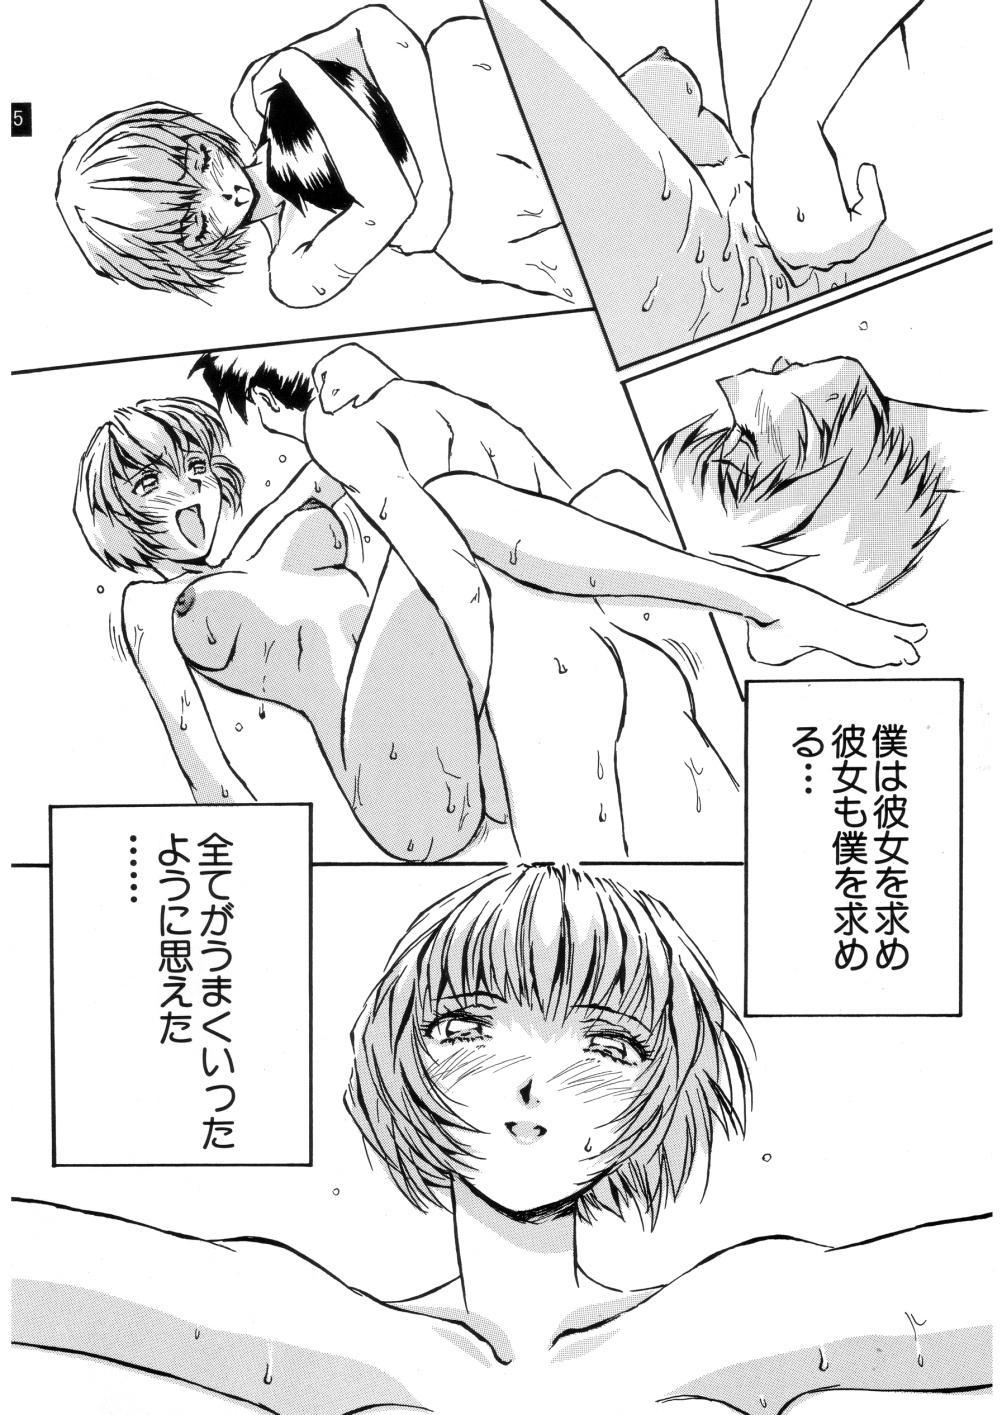 Zense Ki no Evangerikosan 85